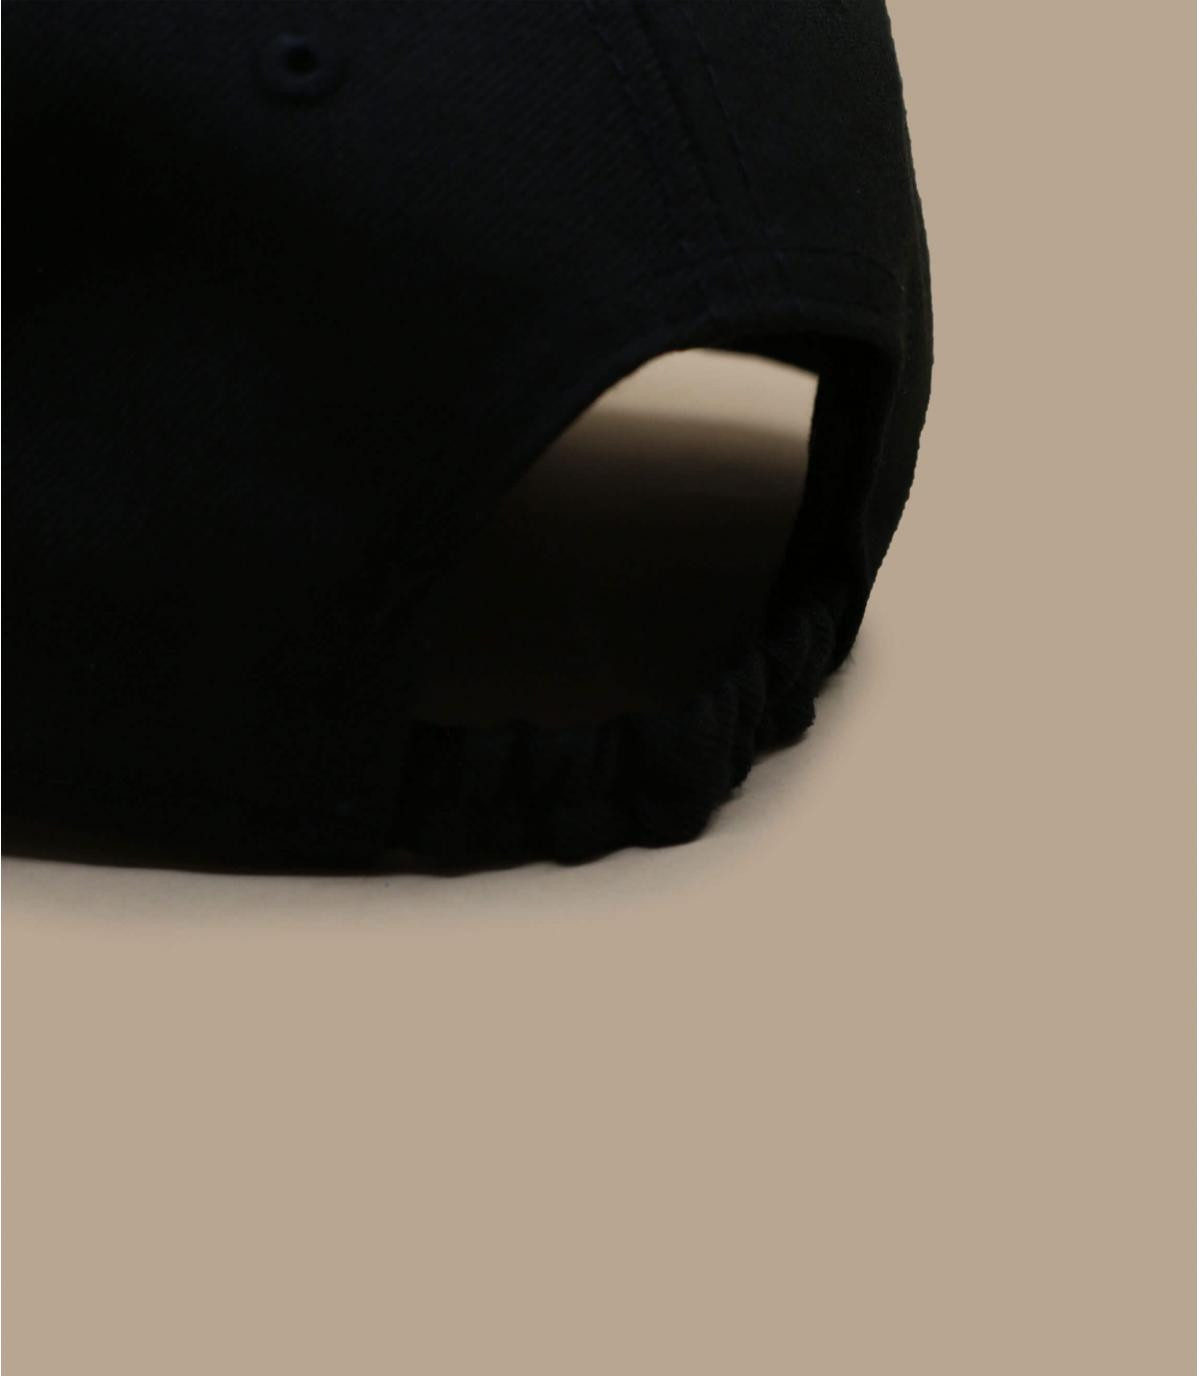 Details Baby Neon Pack NY 940 black orange - Abbildung 3